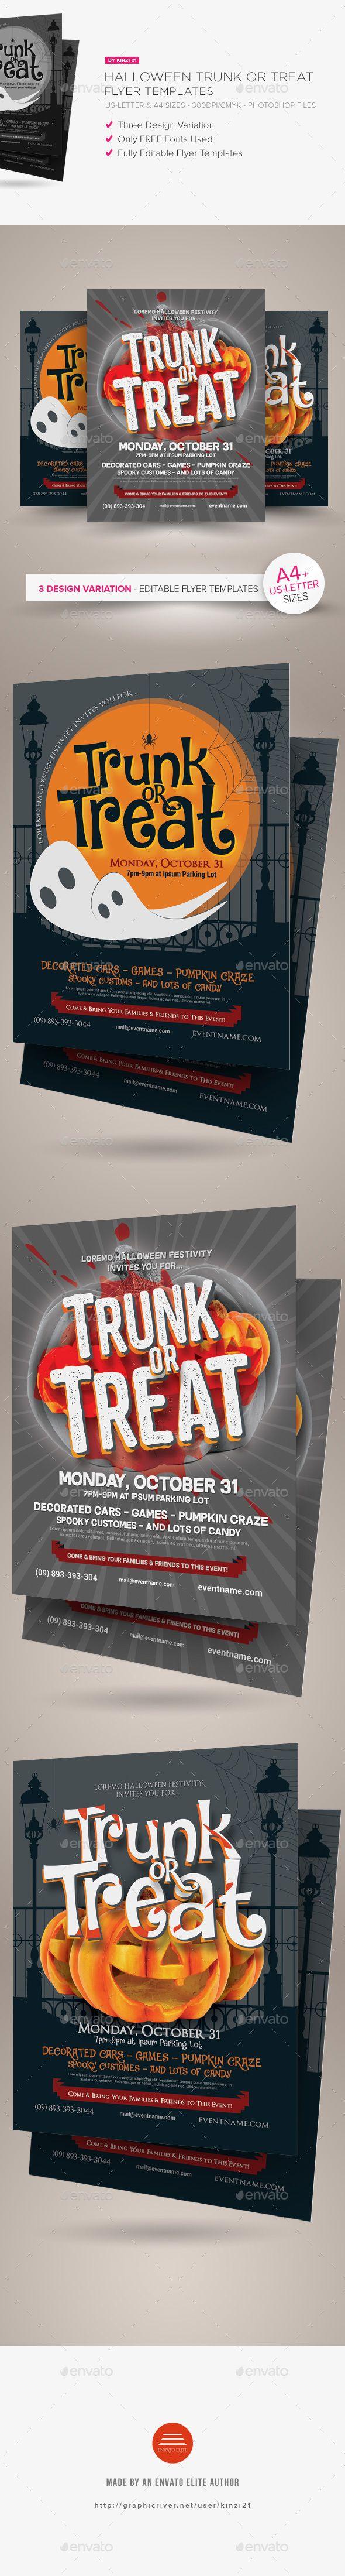 280 best flyer templates images on pinterest cover letter sample